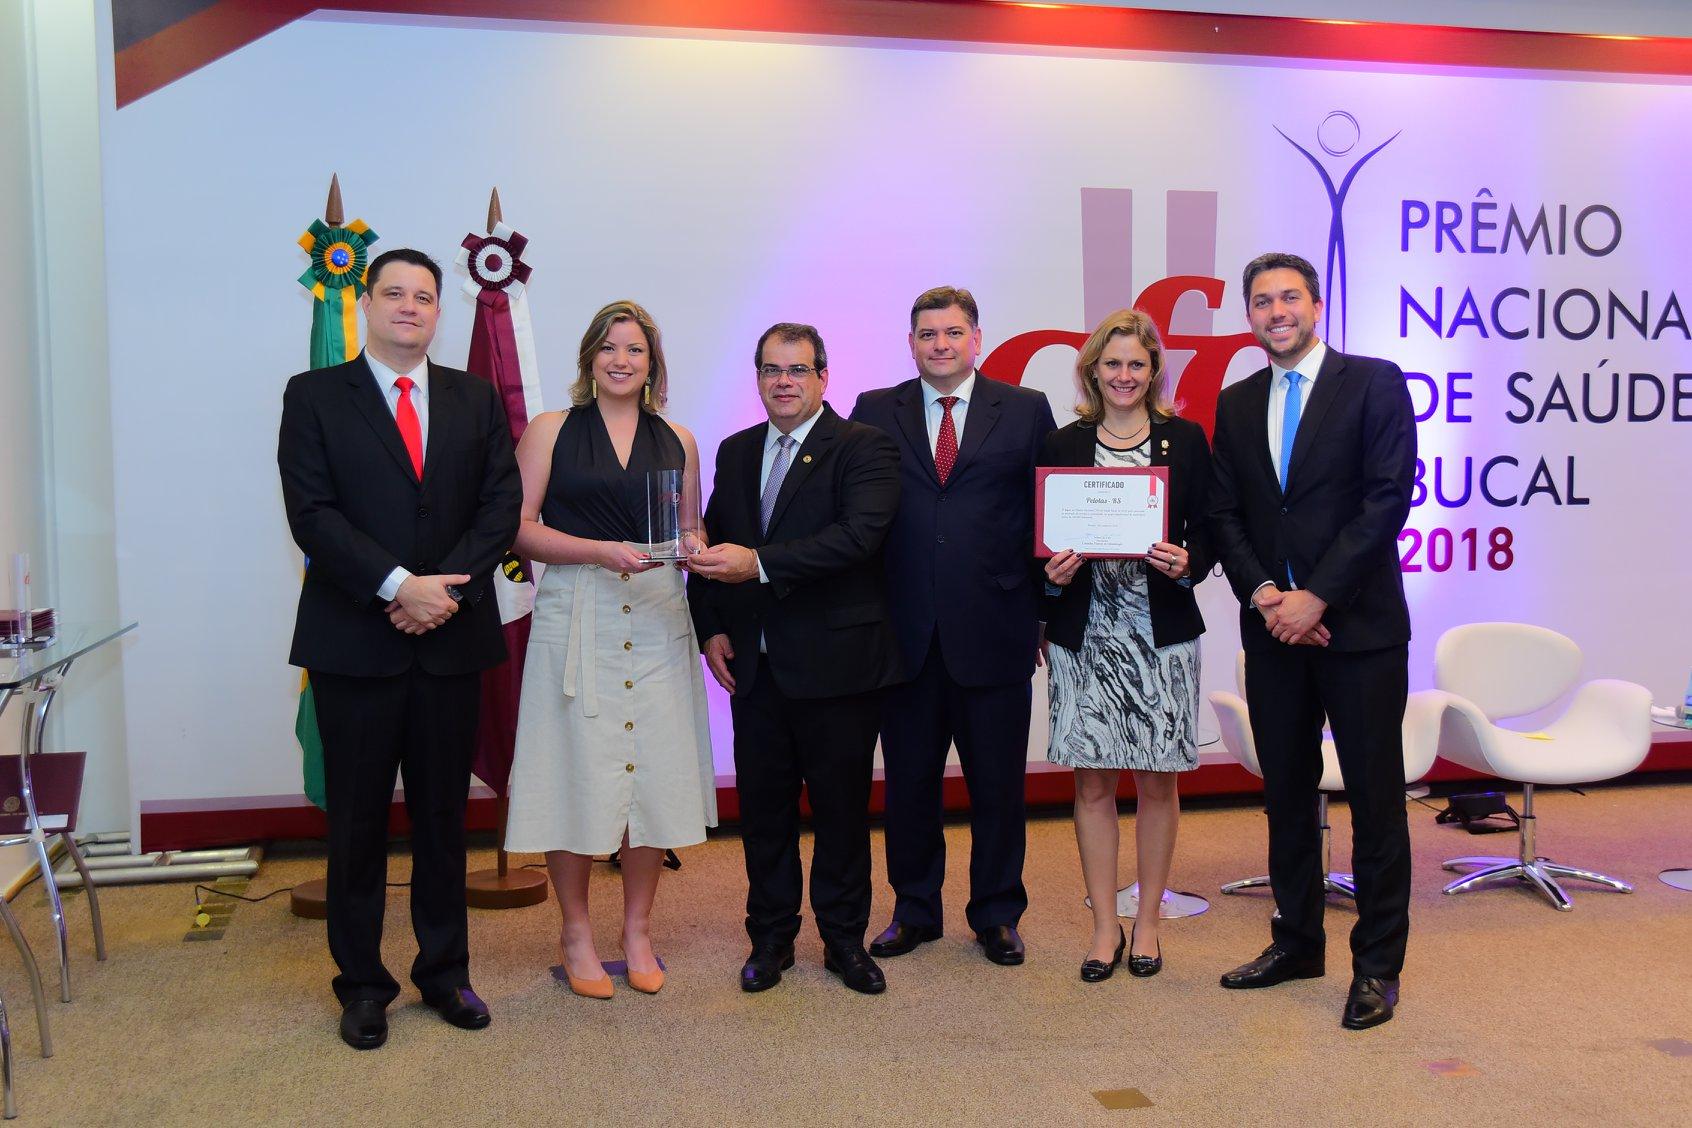 Prêmio Nacional CFO de Saúde Bucal - 2018